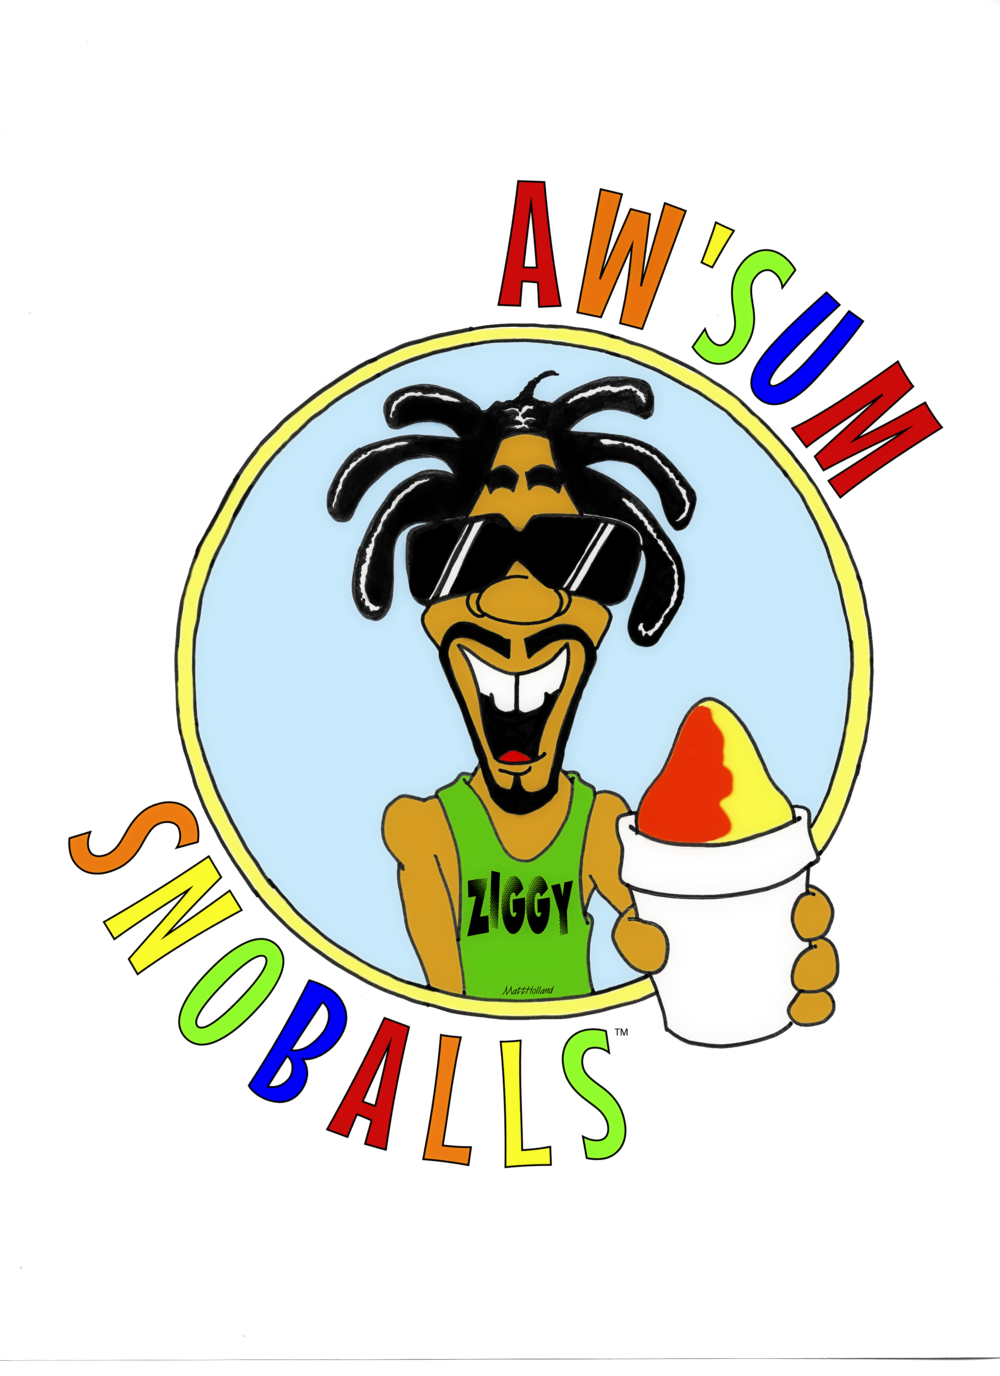 AW'sum Snoballs